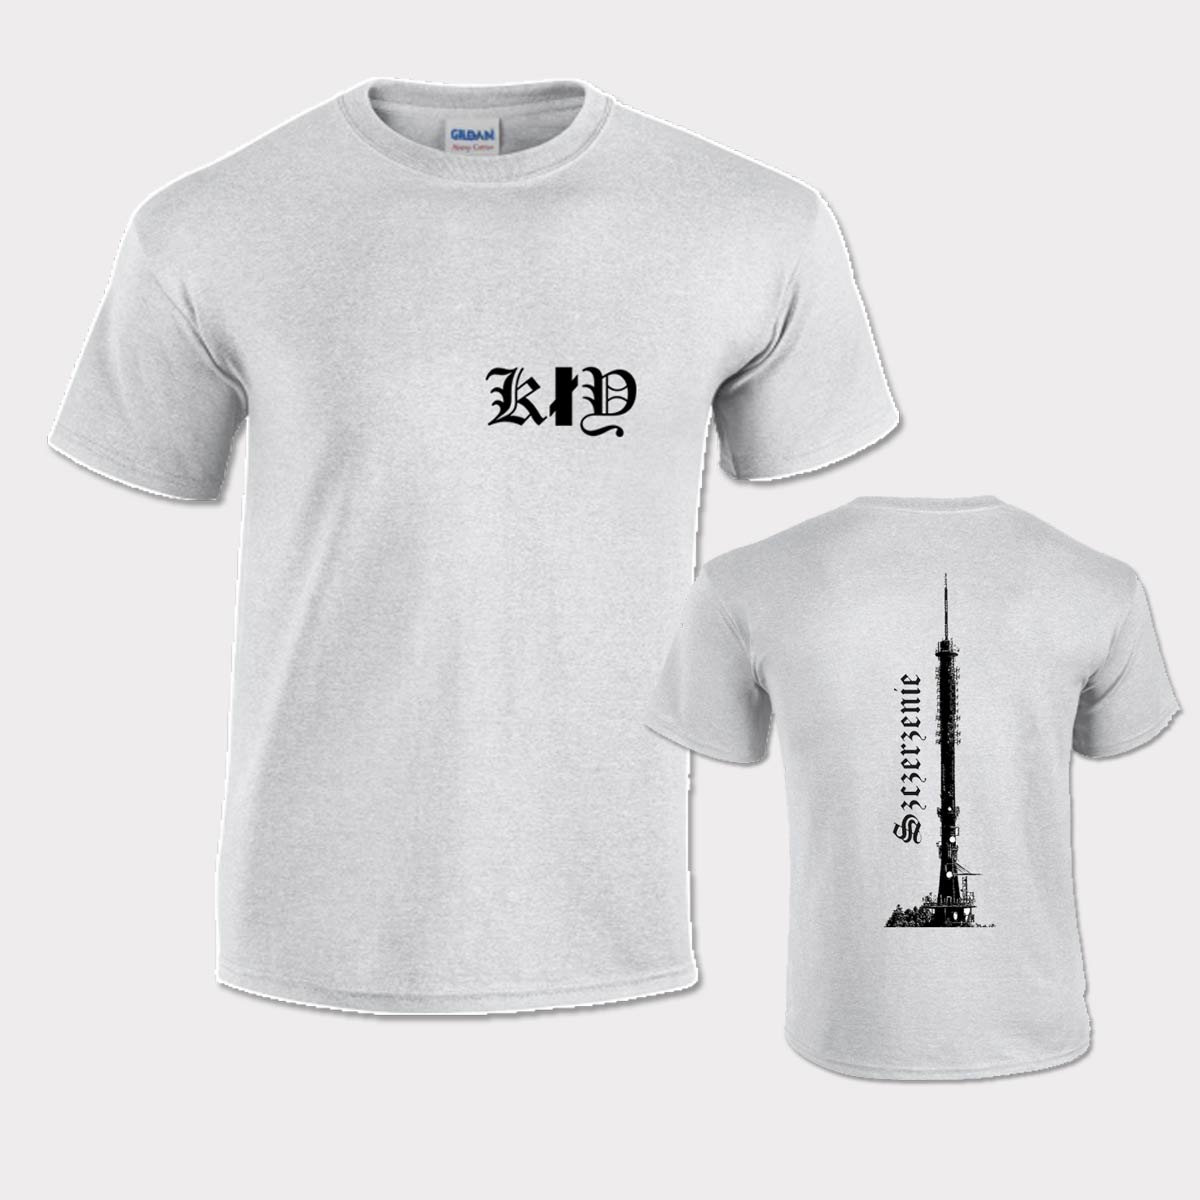 Sports T Shirt Design Software Free Download Agbu Hye Geen